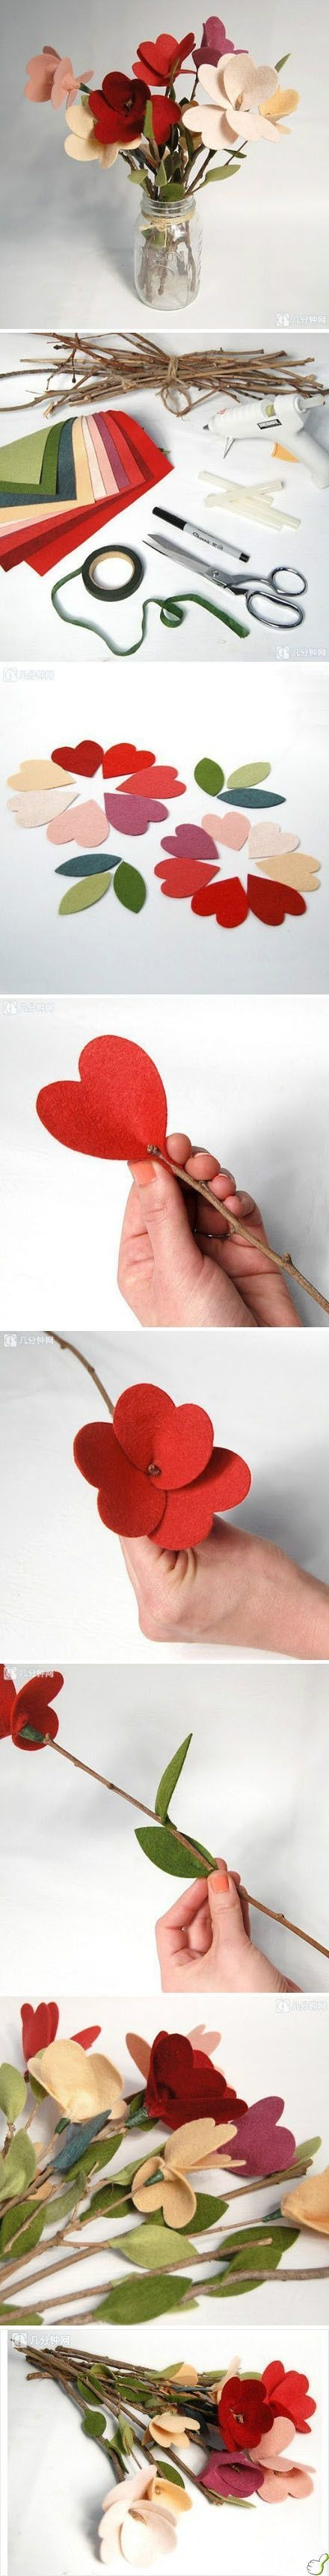 Flores de fetro